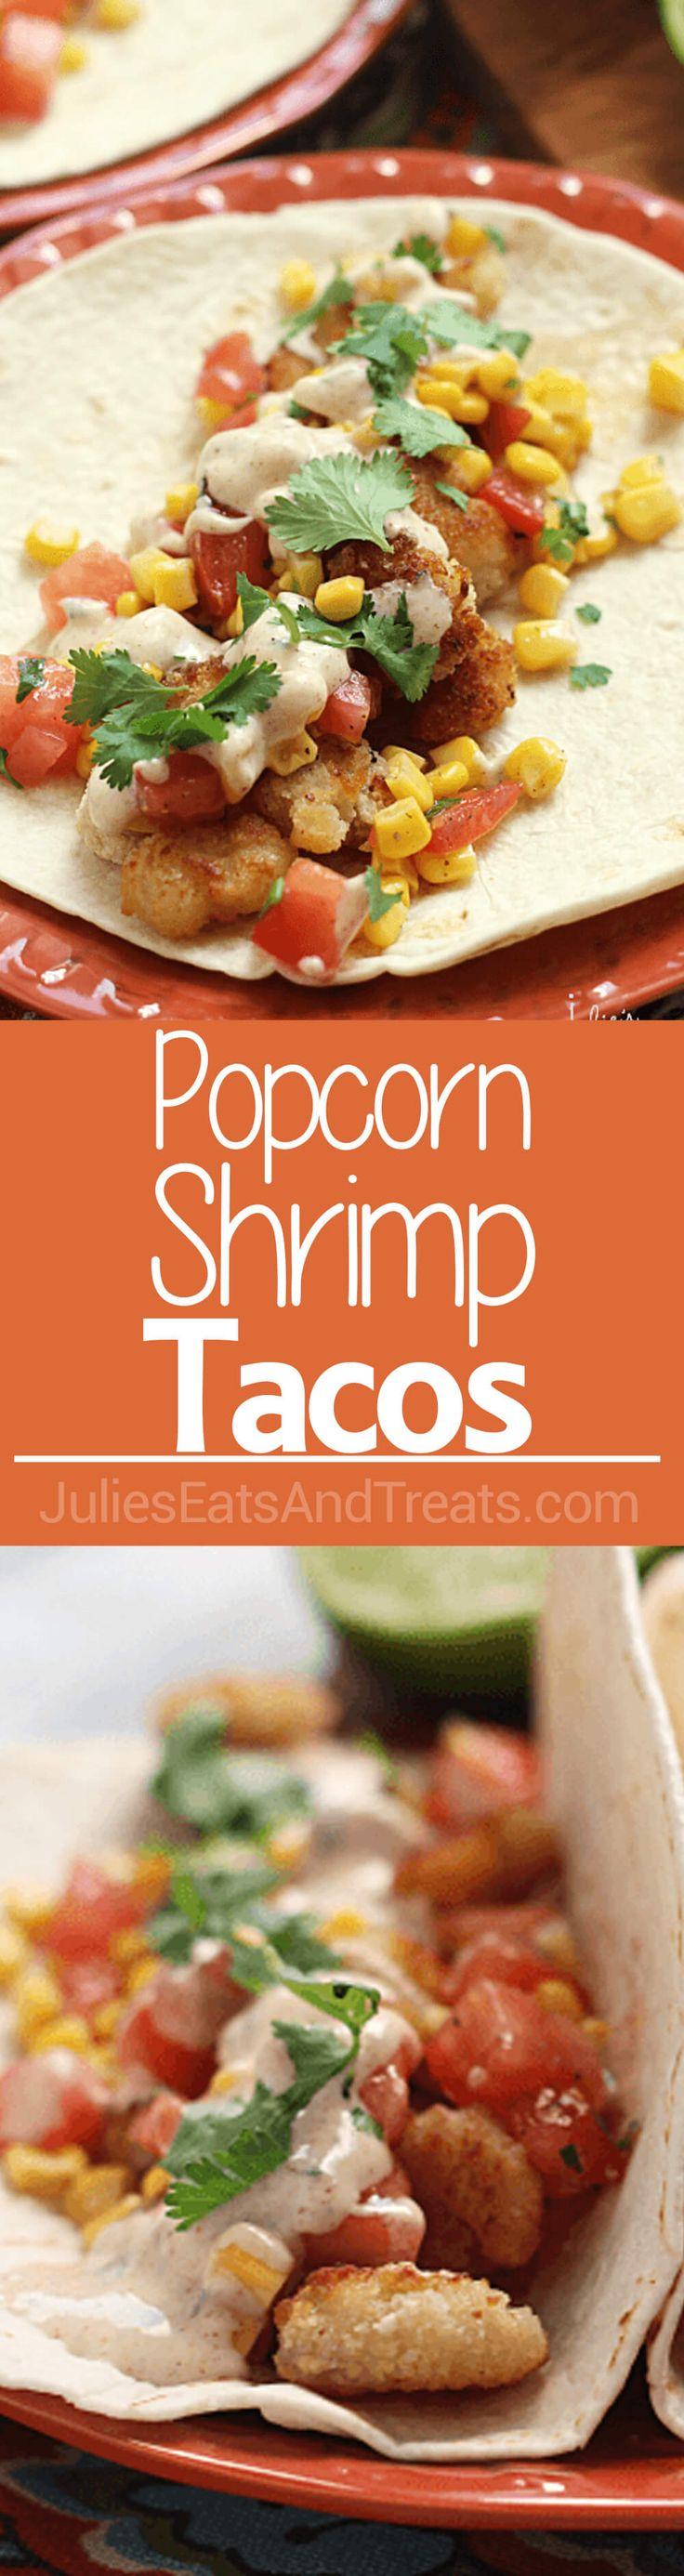 Popcorn Shrimp Tacos with Corn Salsa and Cilantro Lime Sauce ~ Crunchy Popcorn…